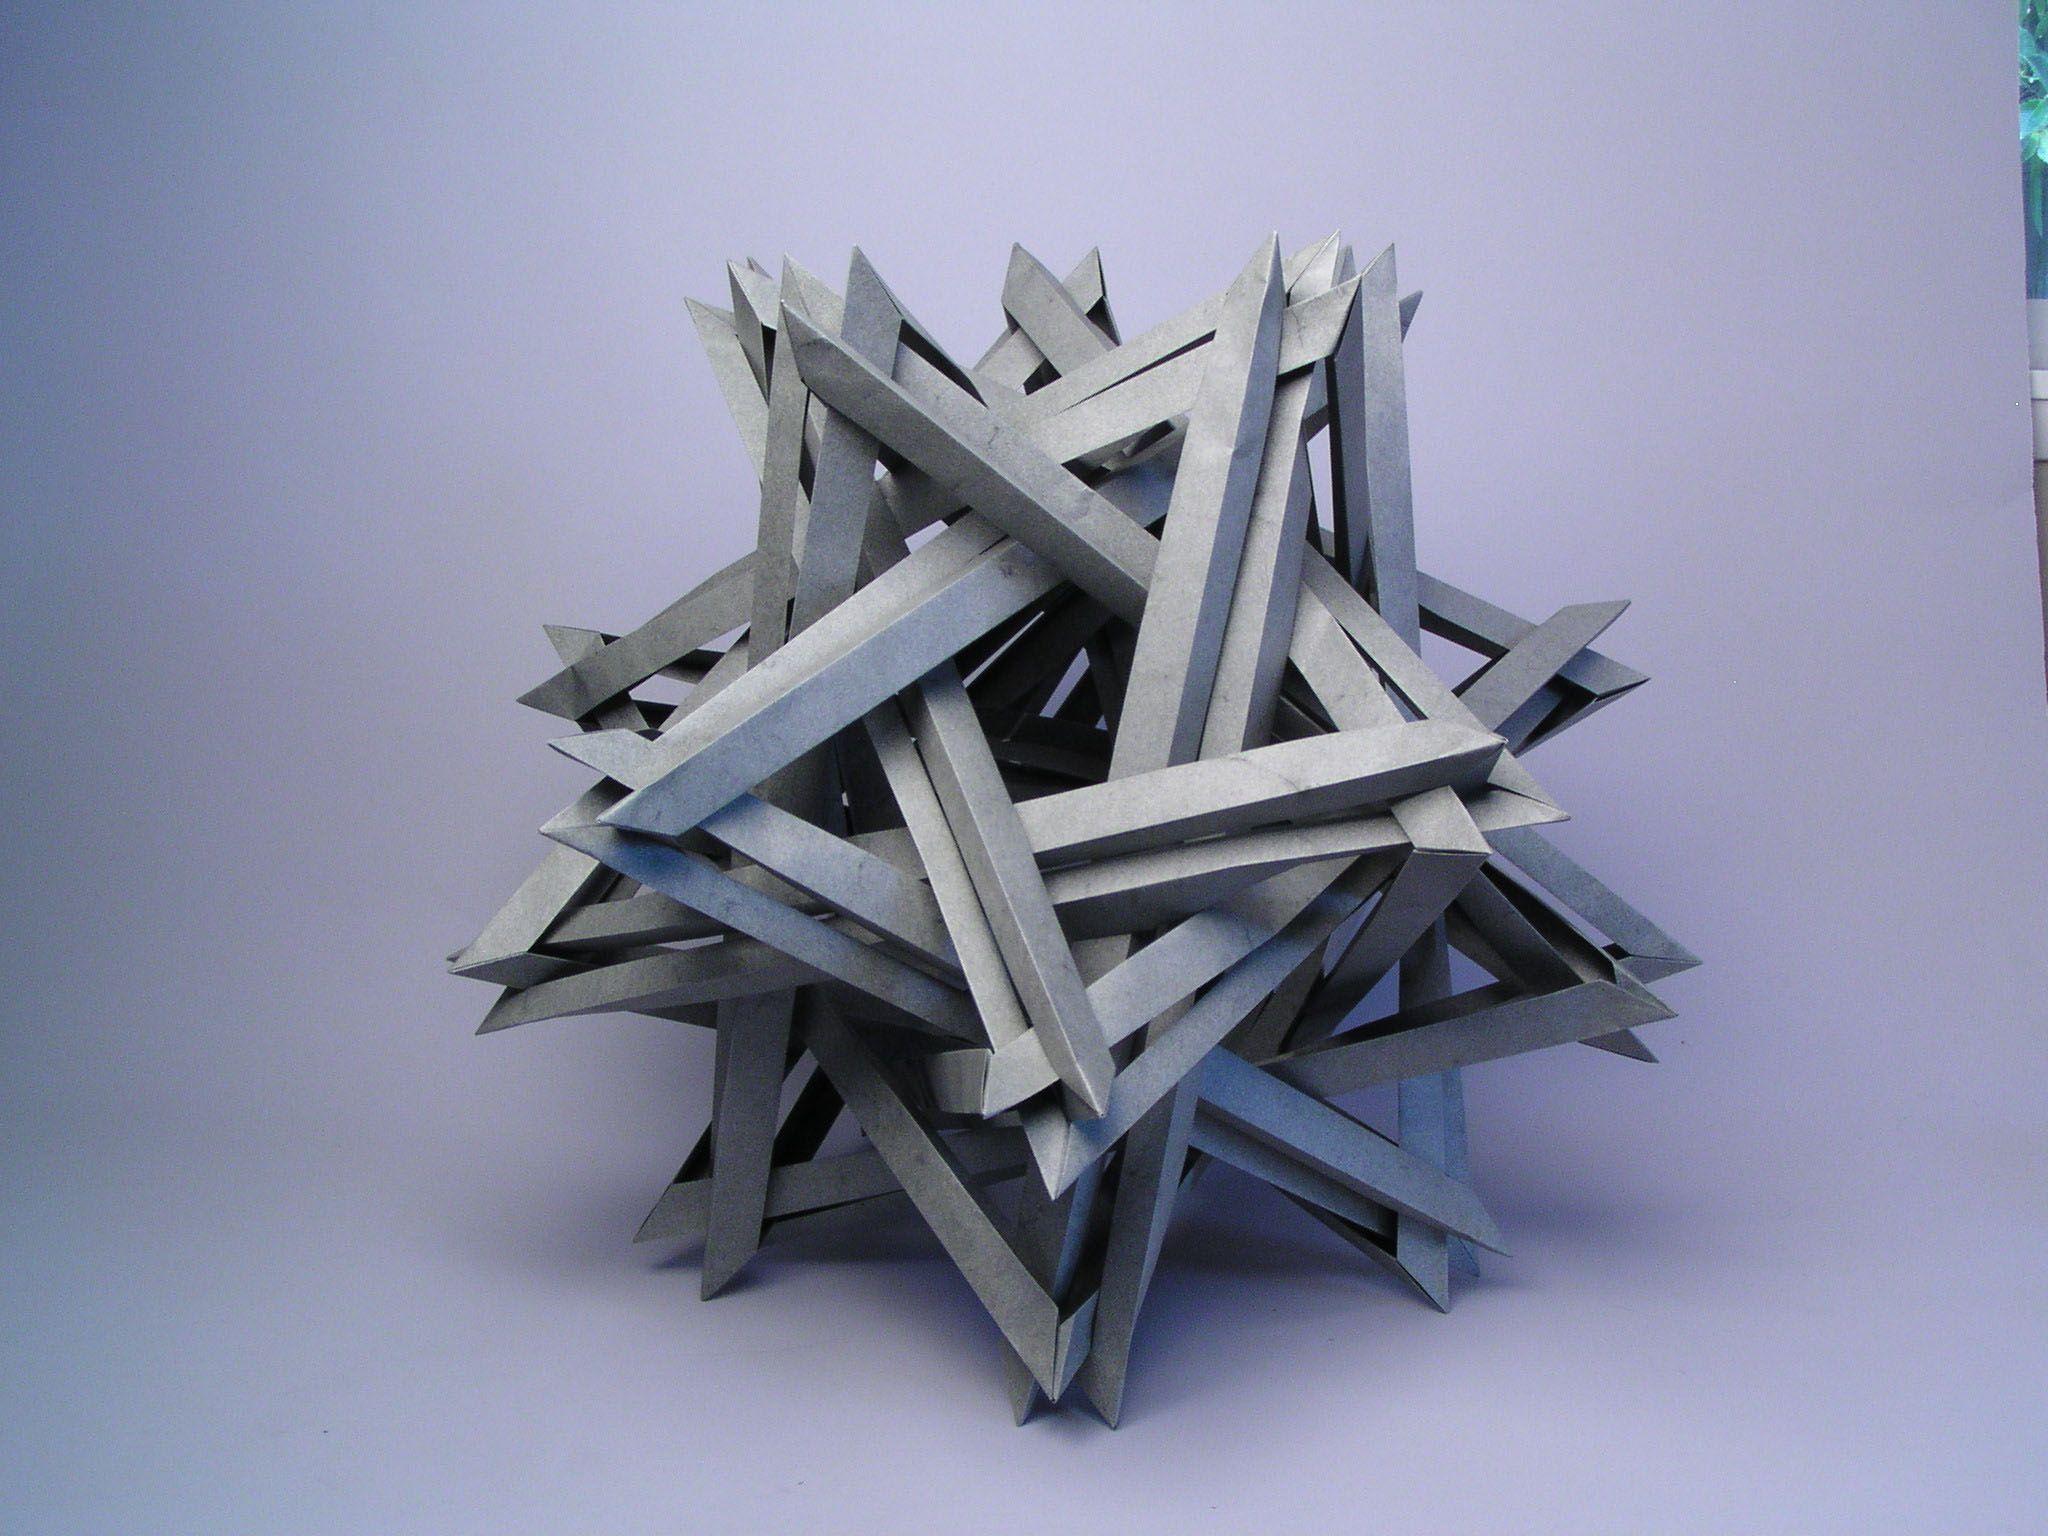 Origami by Dr Robert Lang - Visi | 1536x2048